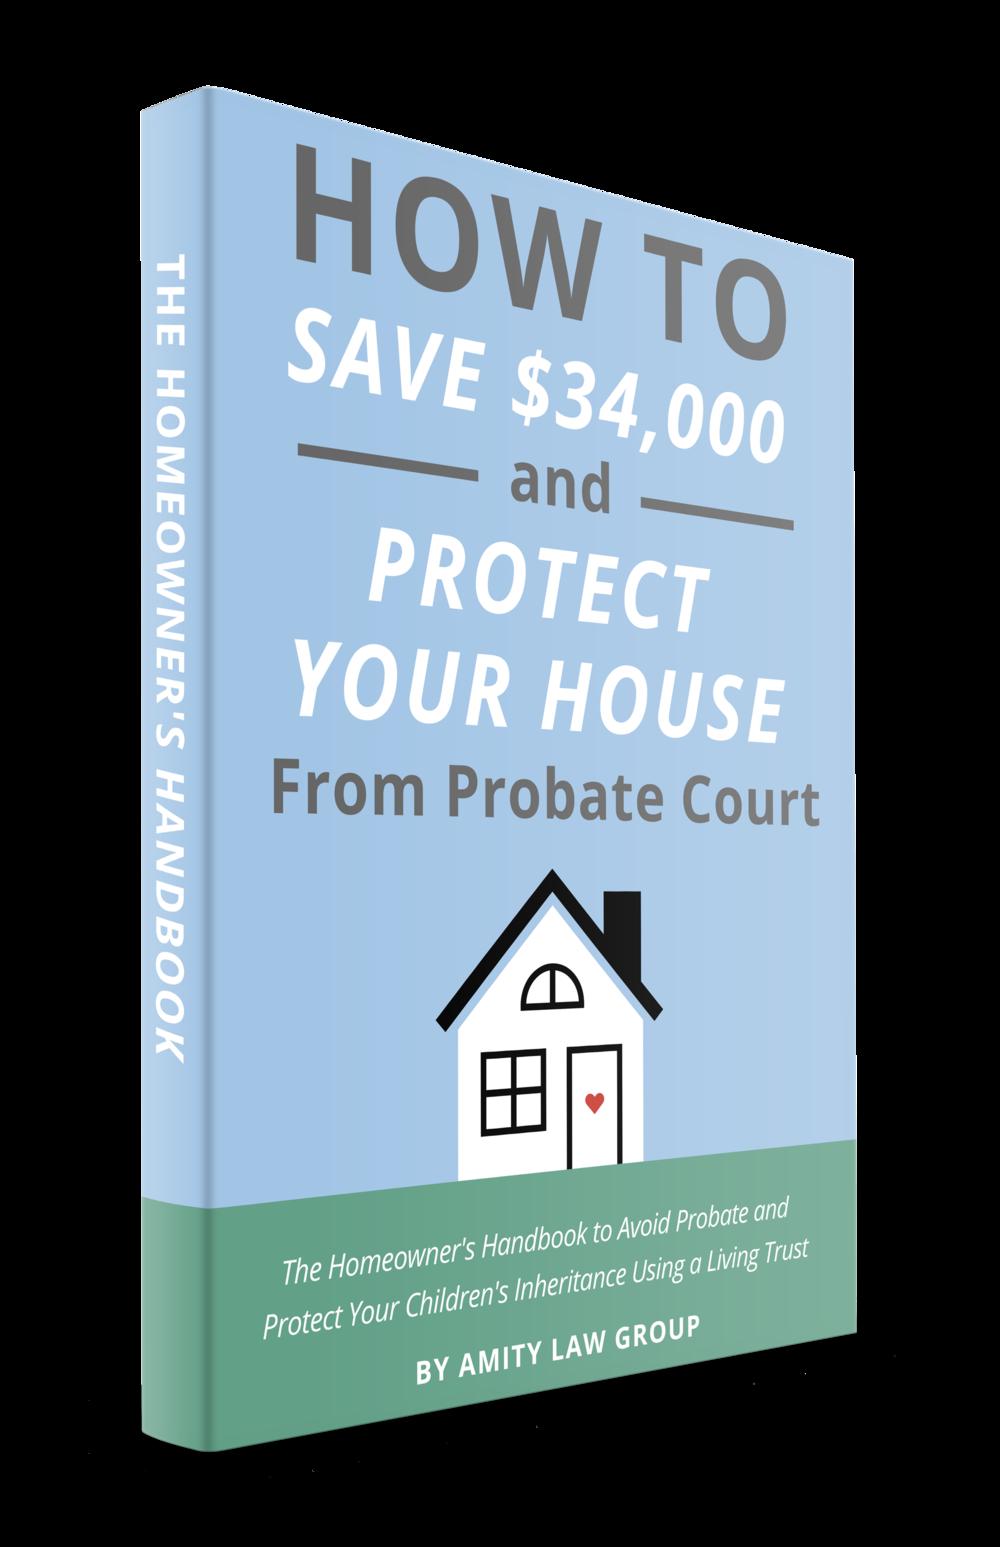 Homeowner's Handbook Cover 3D (Transparent).png